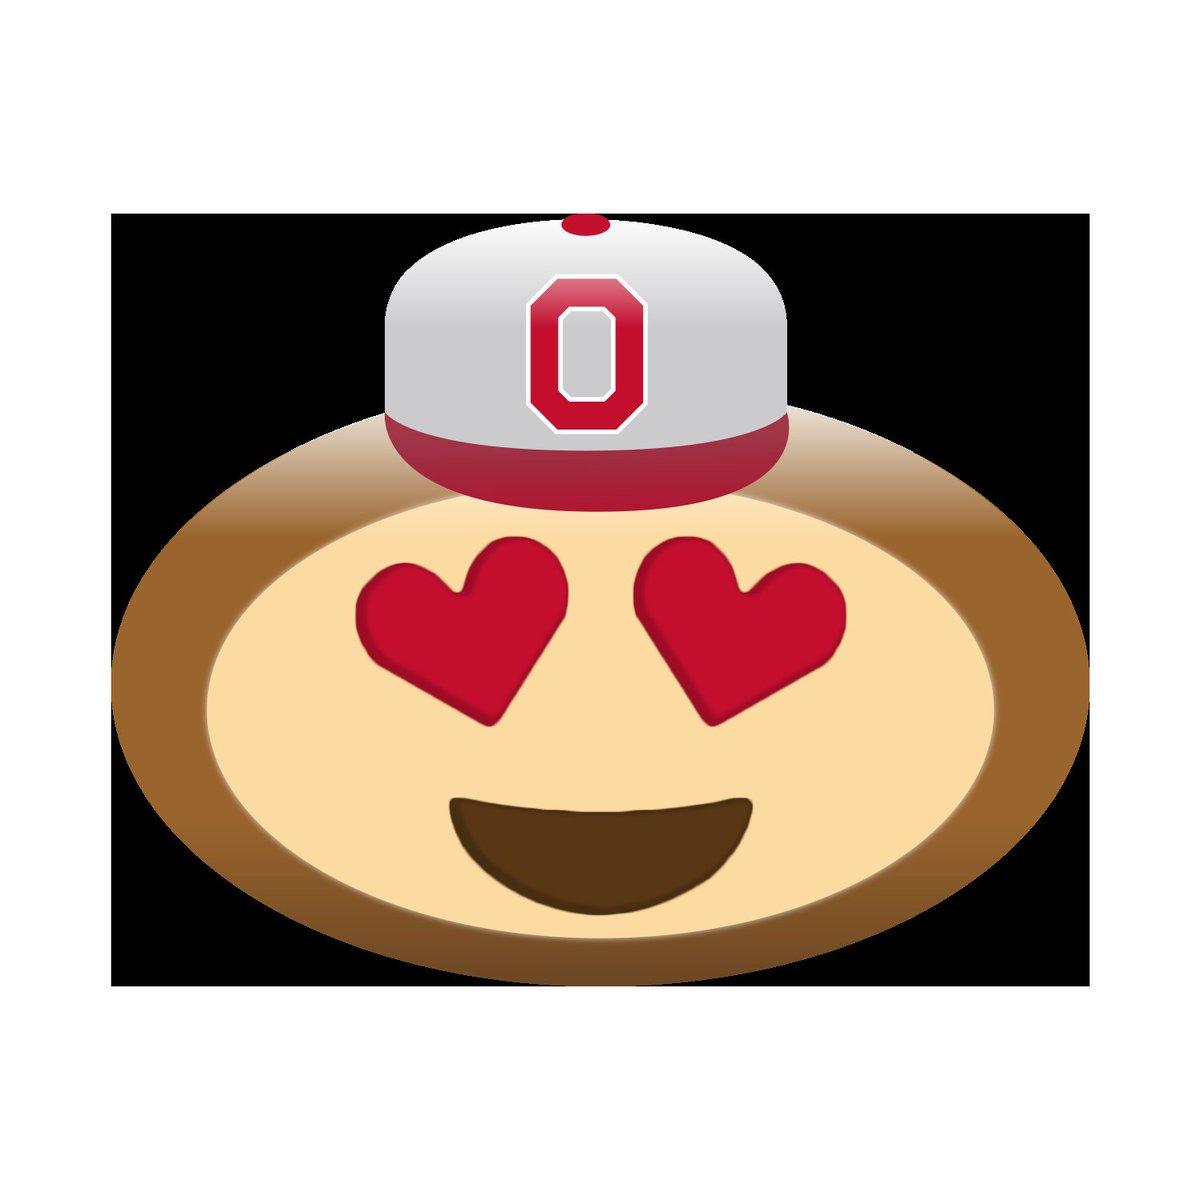 Absolutely ❤️ the @Brutus_Buckeye brutmojis! Bring on @OhioStateFB #IsItFootballSeasonYet https://t.co/bB2QGdboXD